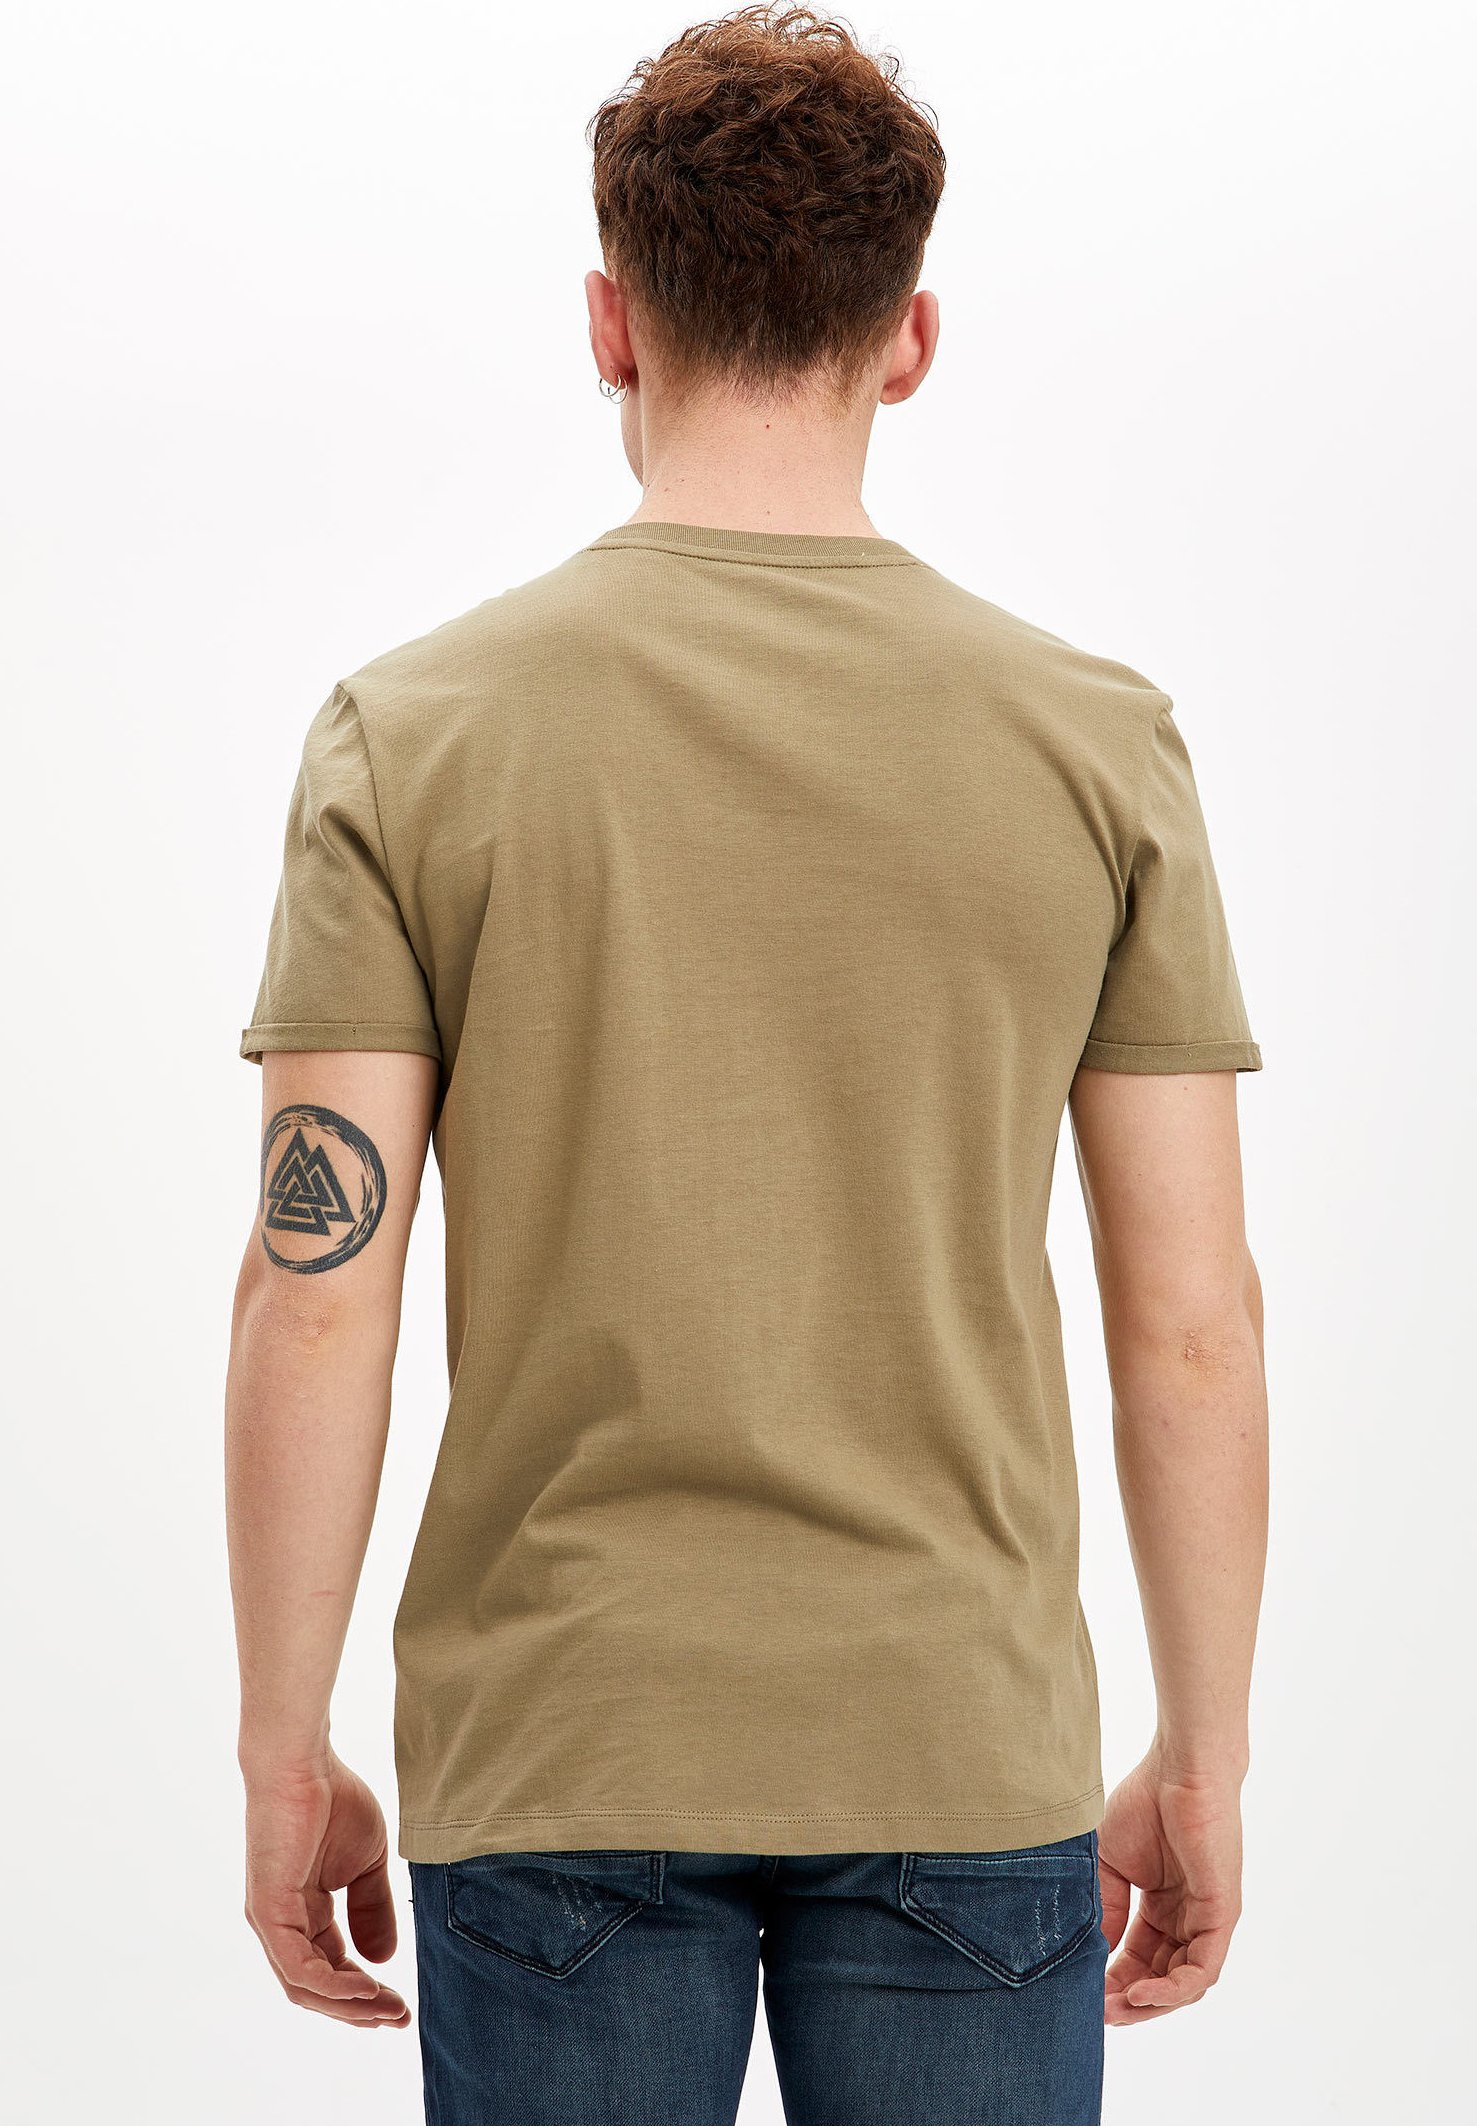 DeFacto Basic T-shirt - khaki tVNm3